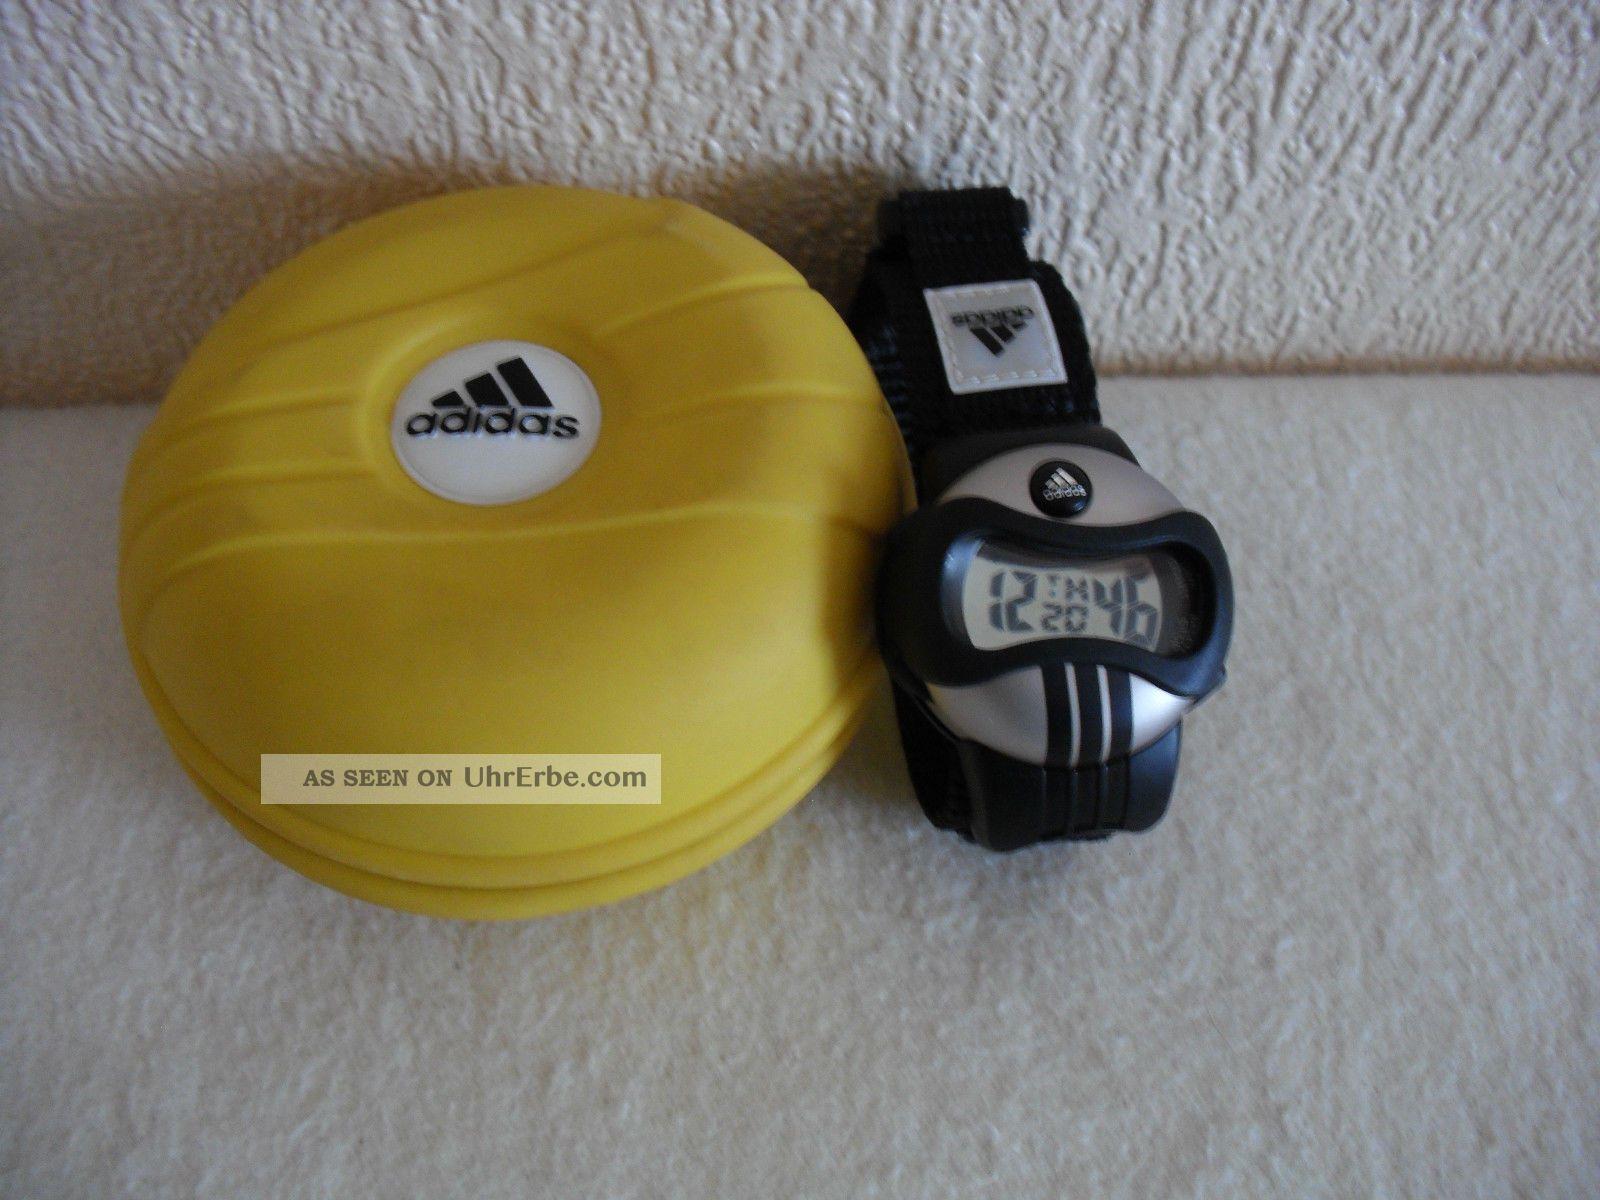 Adidas Lcd Sport Armbanduhr Armbanduhren Bild